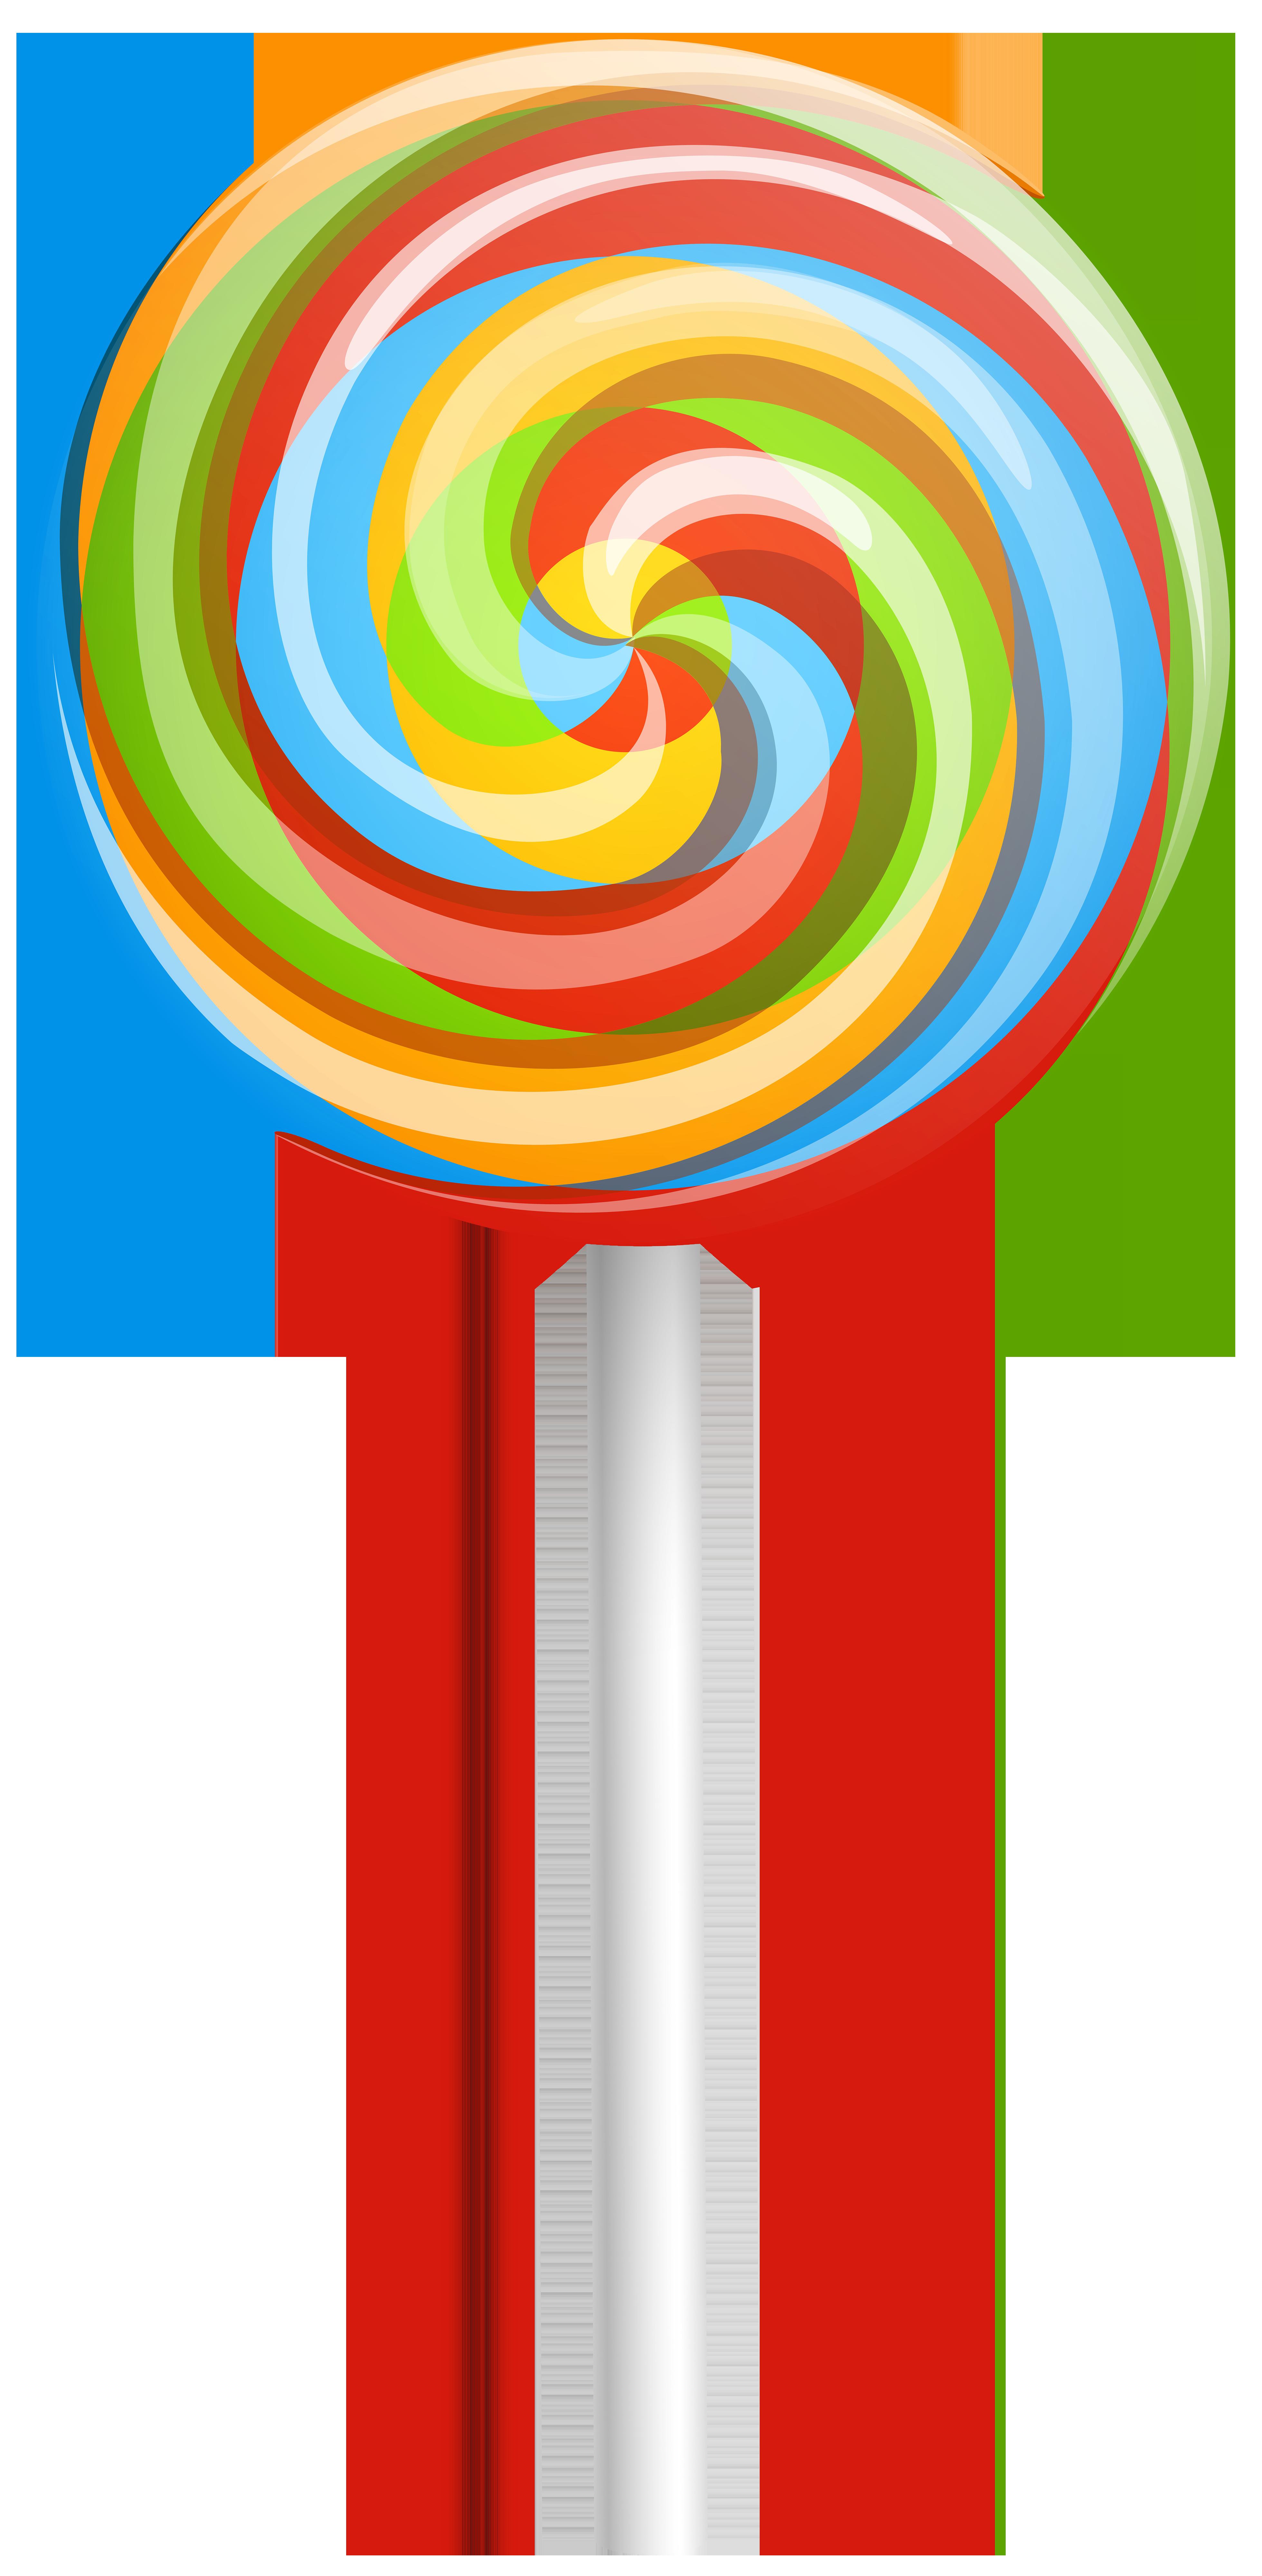 Rainbow swirl lollipop clip art image